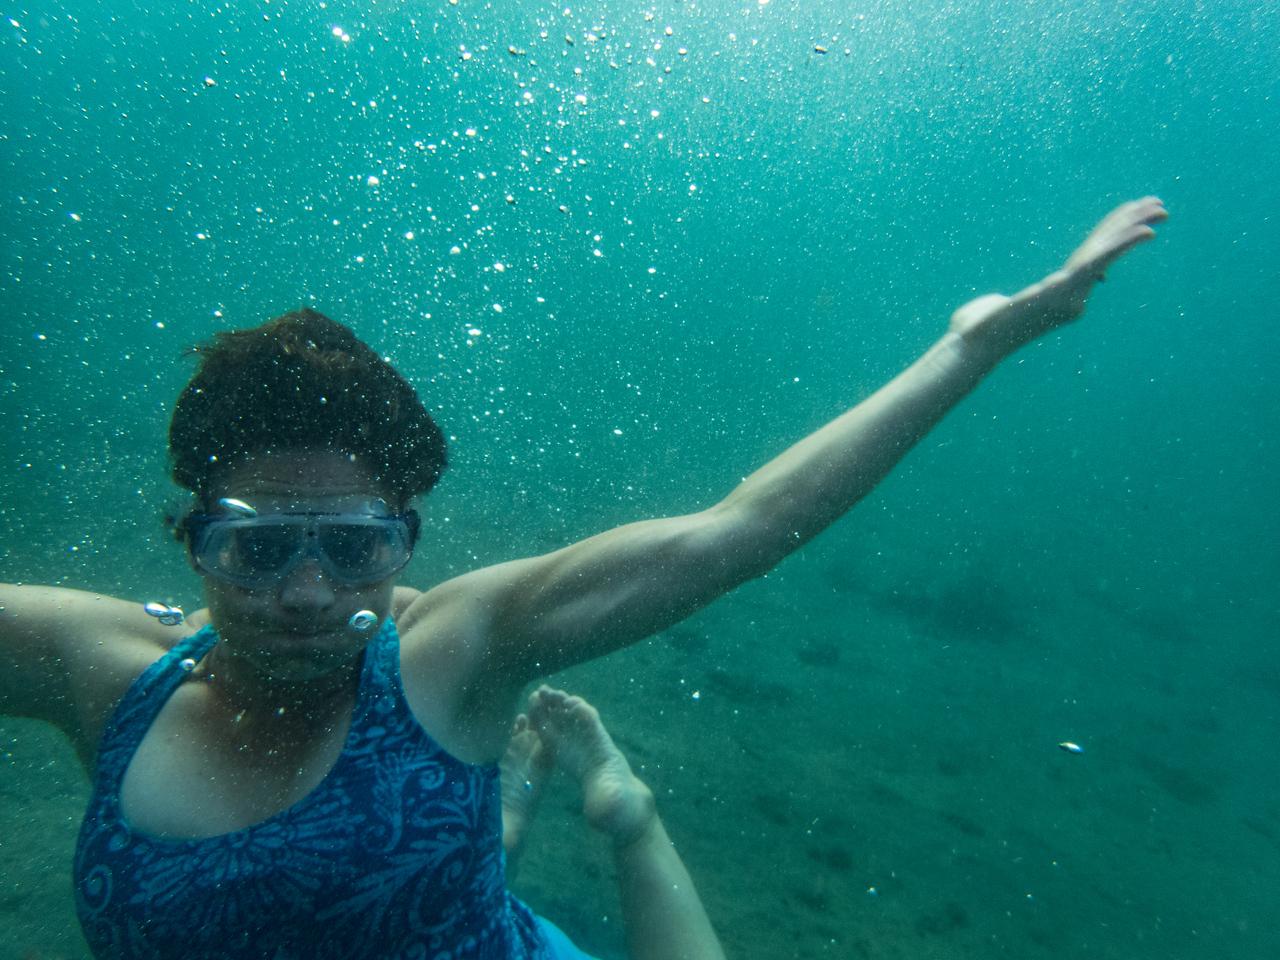 Lisa swimming